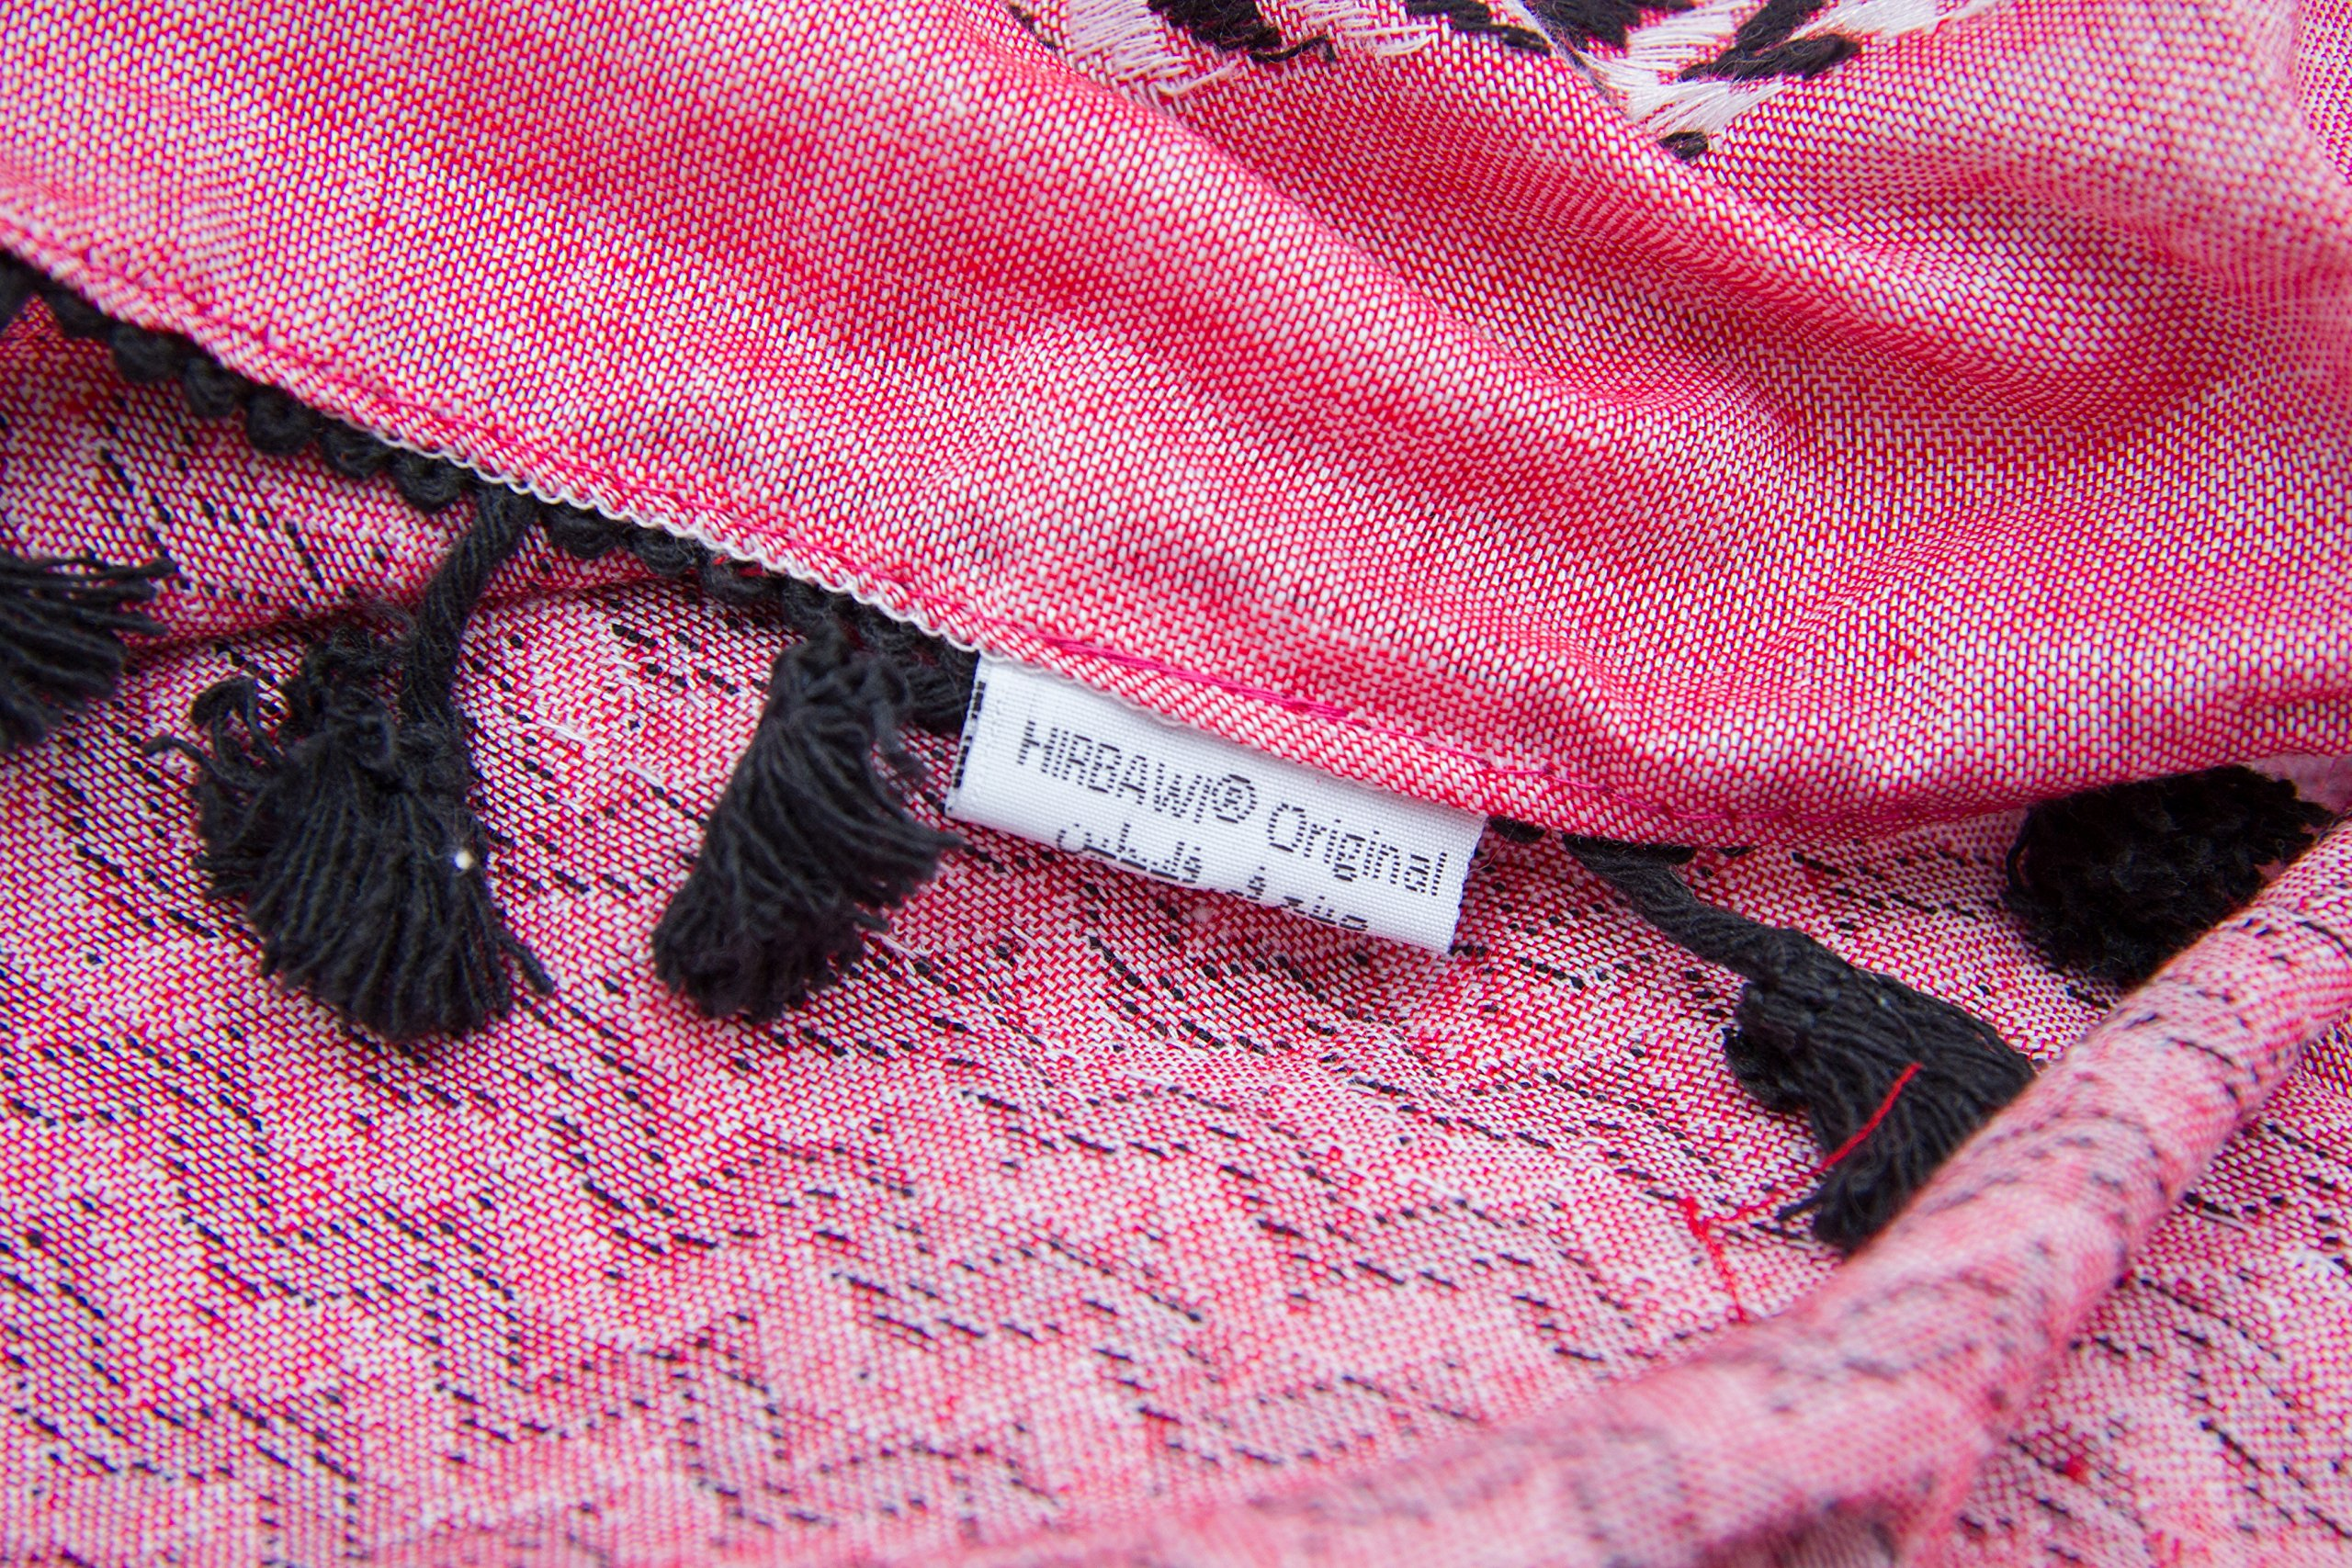 Hirbawi Premium Arabic Scarf 100% Cotton Shemagh Keffiyeh 47''x47'' Arab Scarf (Pink Zahra) Made in Palestine by Hirbawi (Image #7)